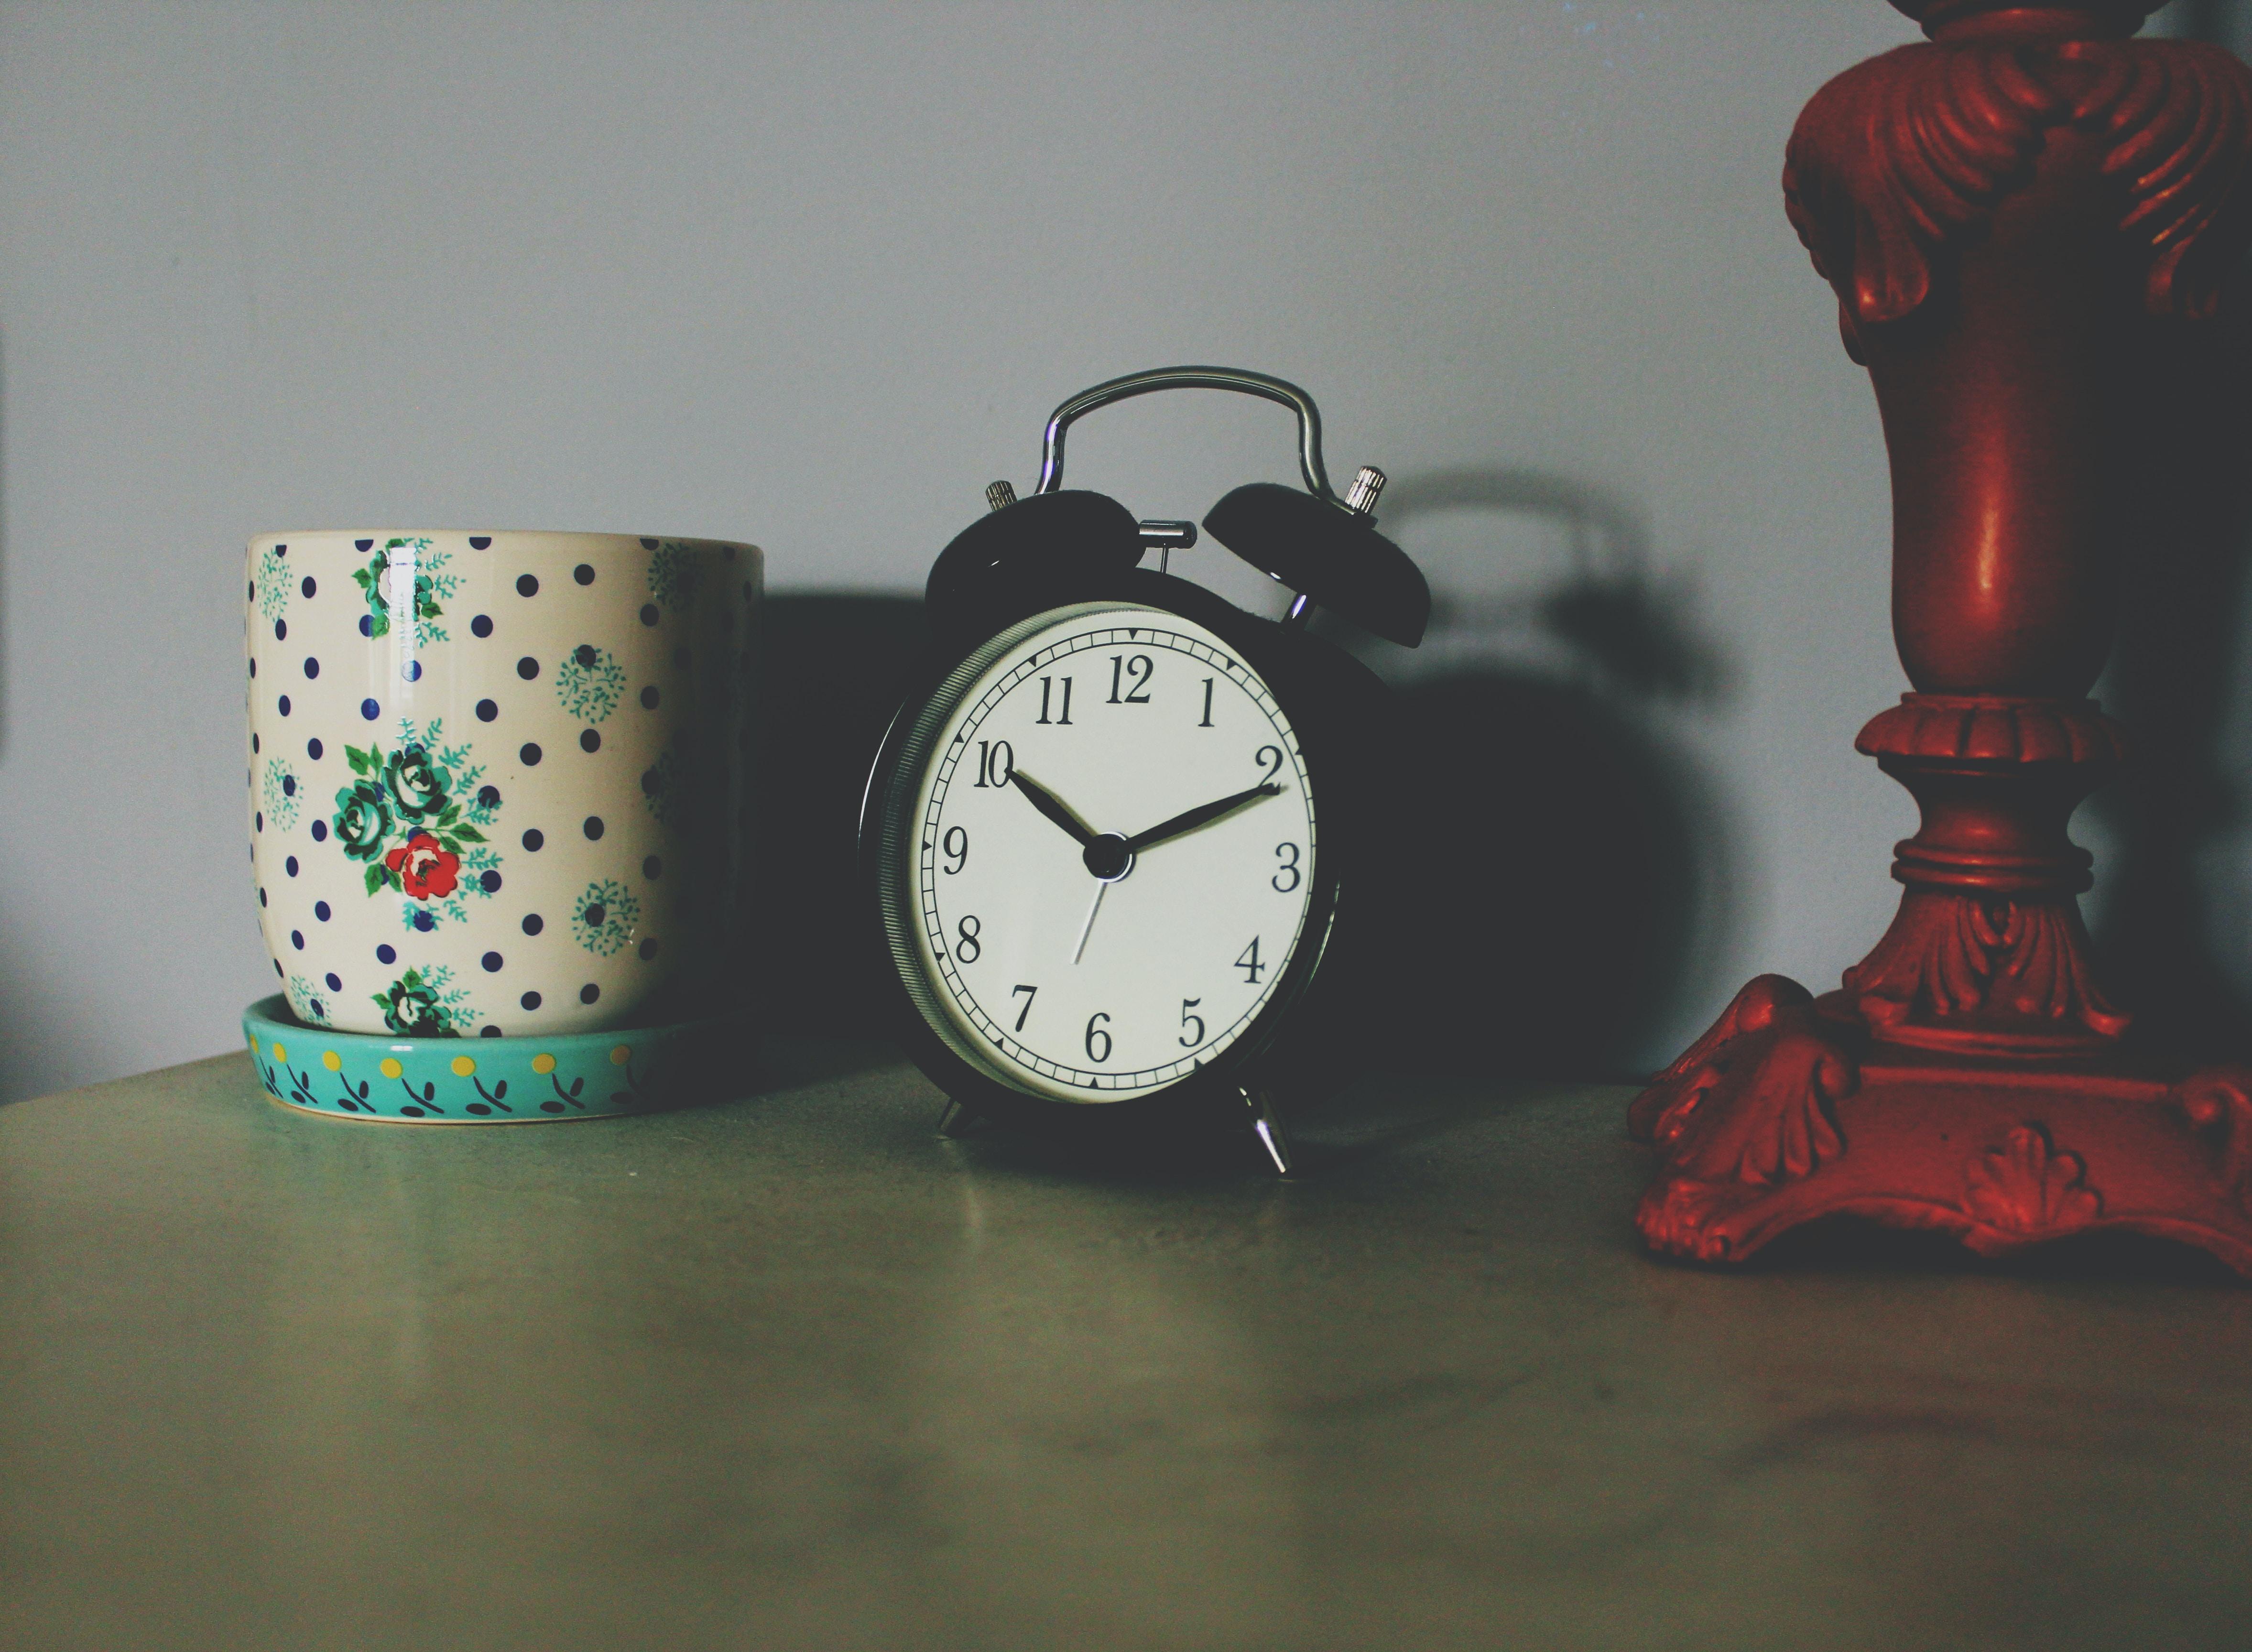 black table clock beside ceramic vase